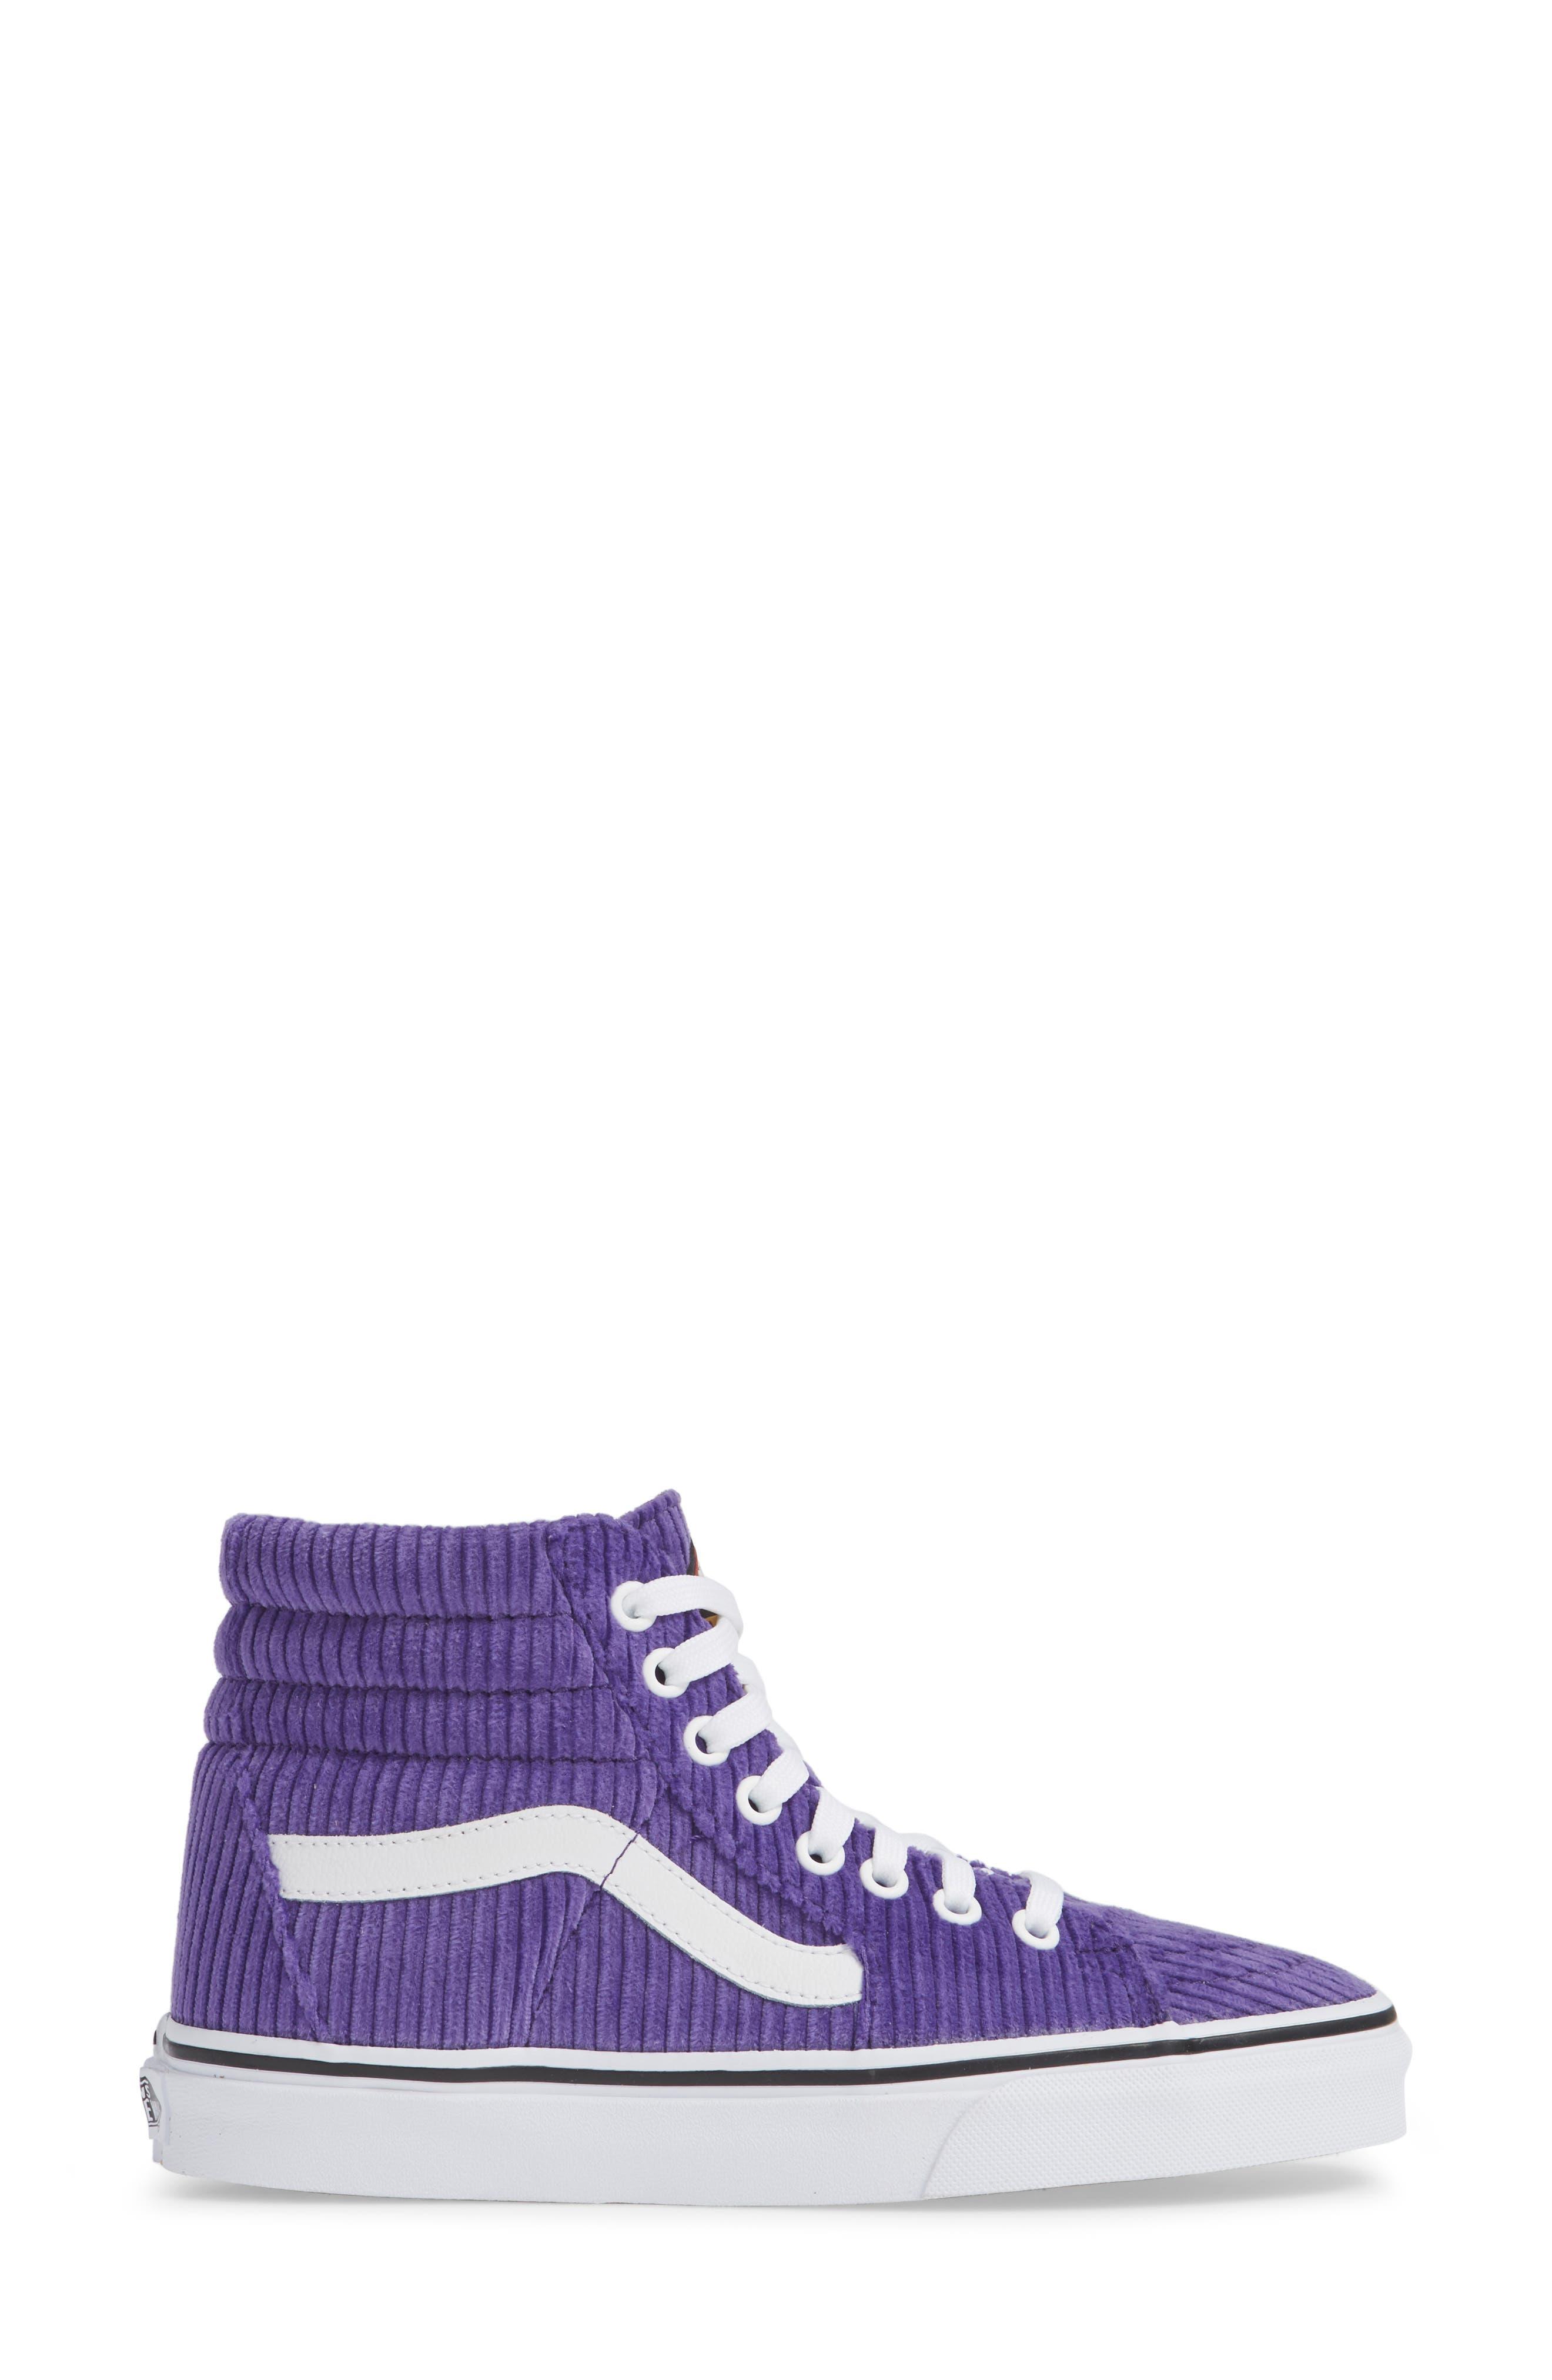 UA Sk8-Hi Design Assembly Sneaker,                             Alternate thumbnail 3, color,                             501